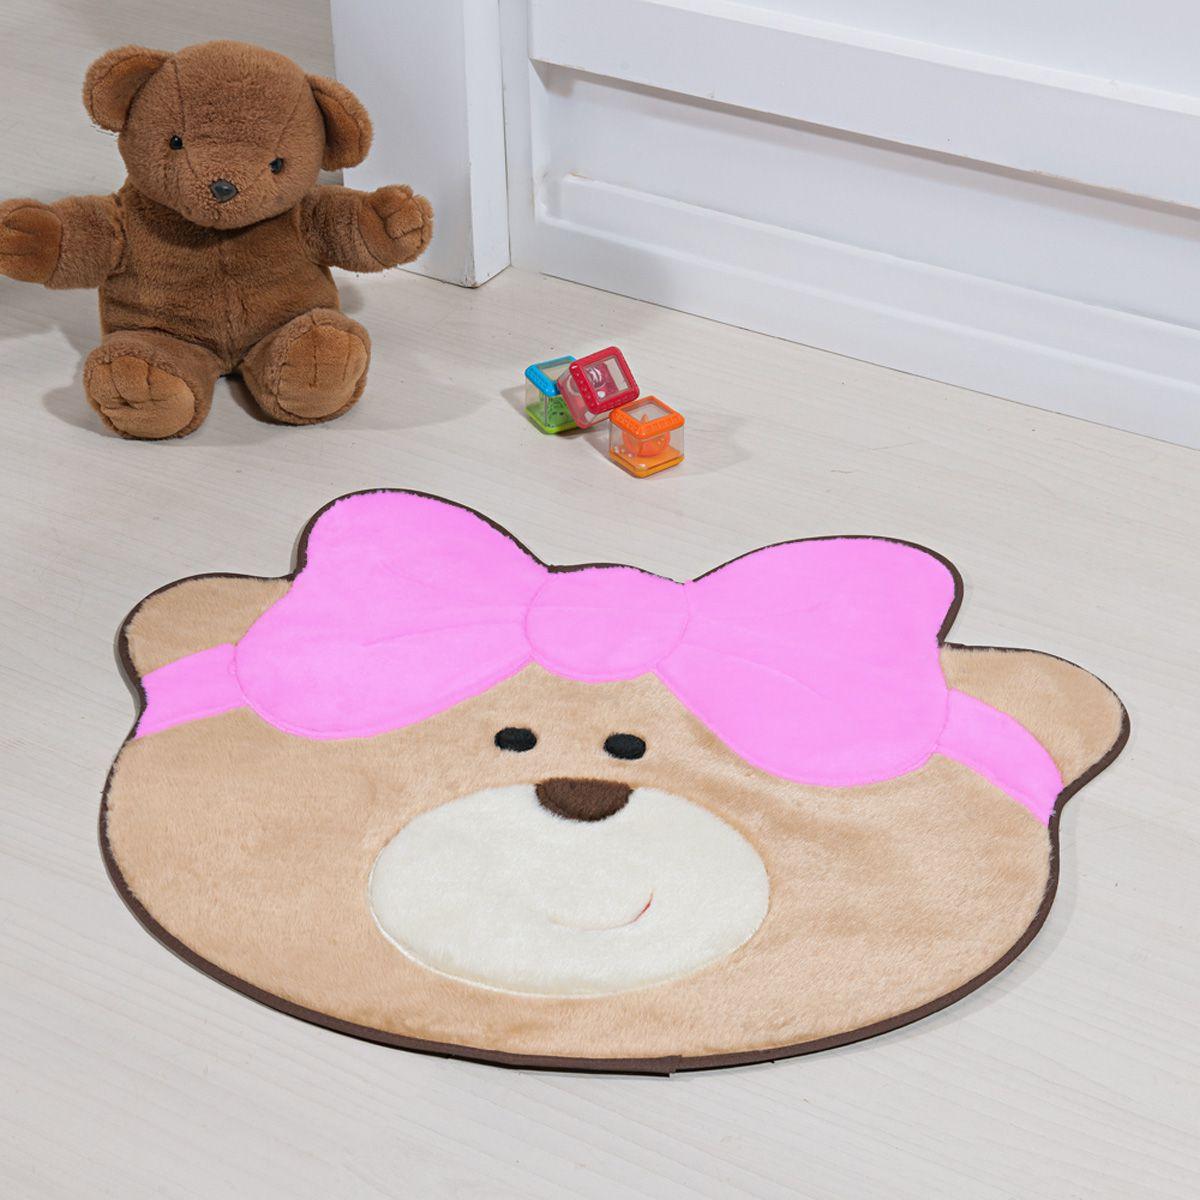 Tapete Infantil Premium Baby Formato Ursinha Laço Rosa 75cm x 62cm